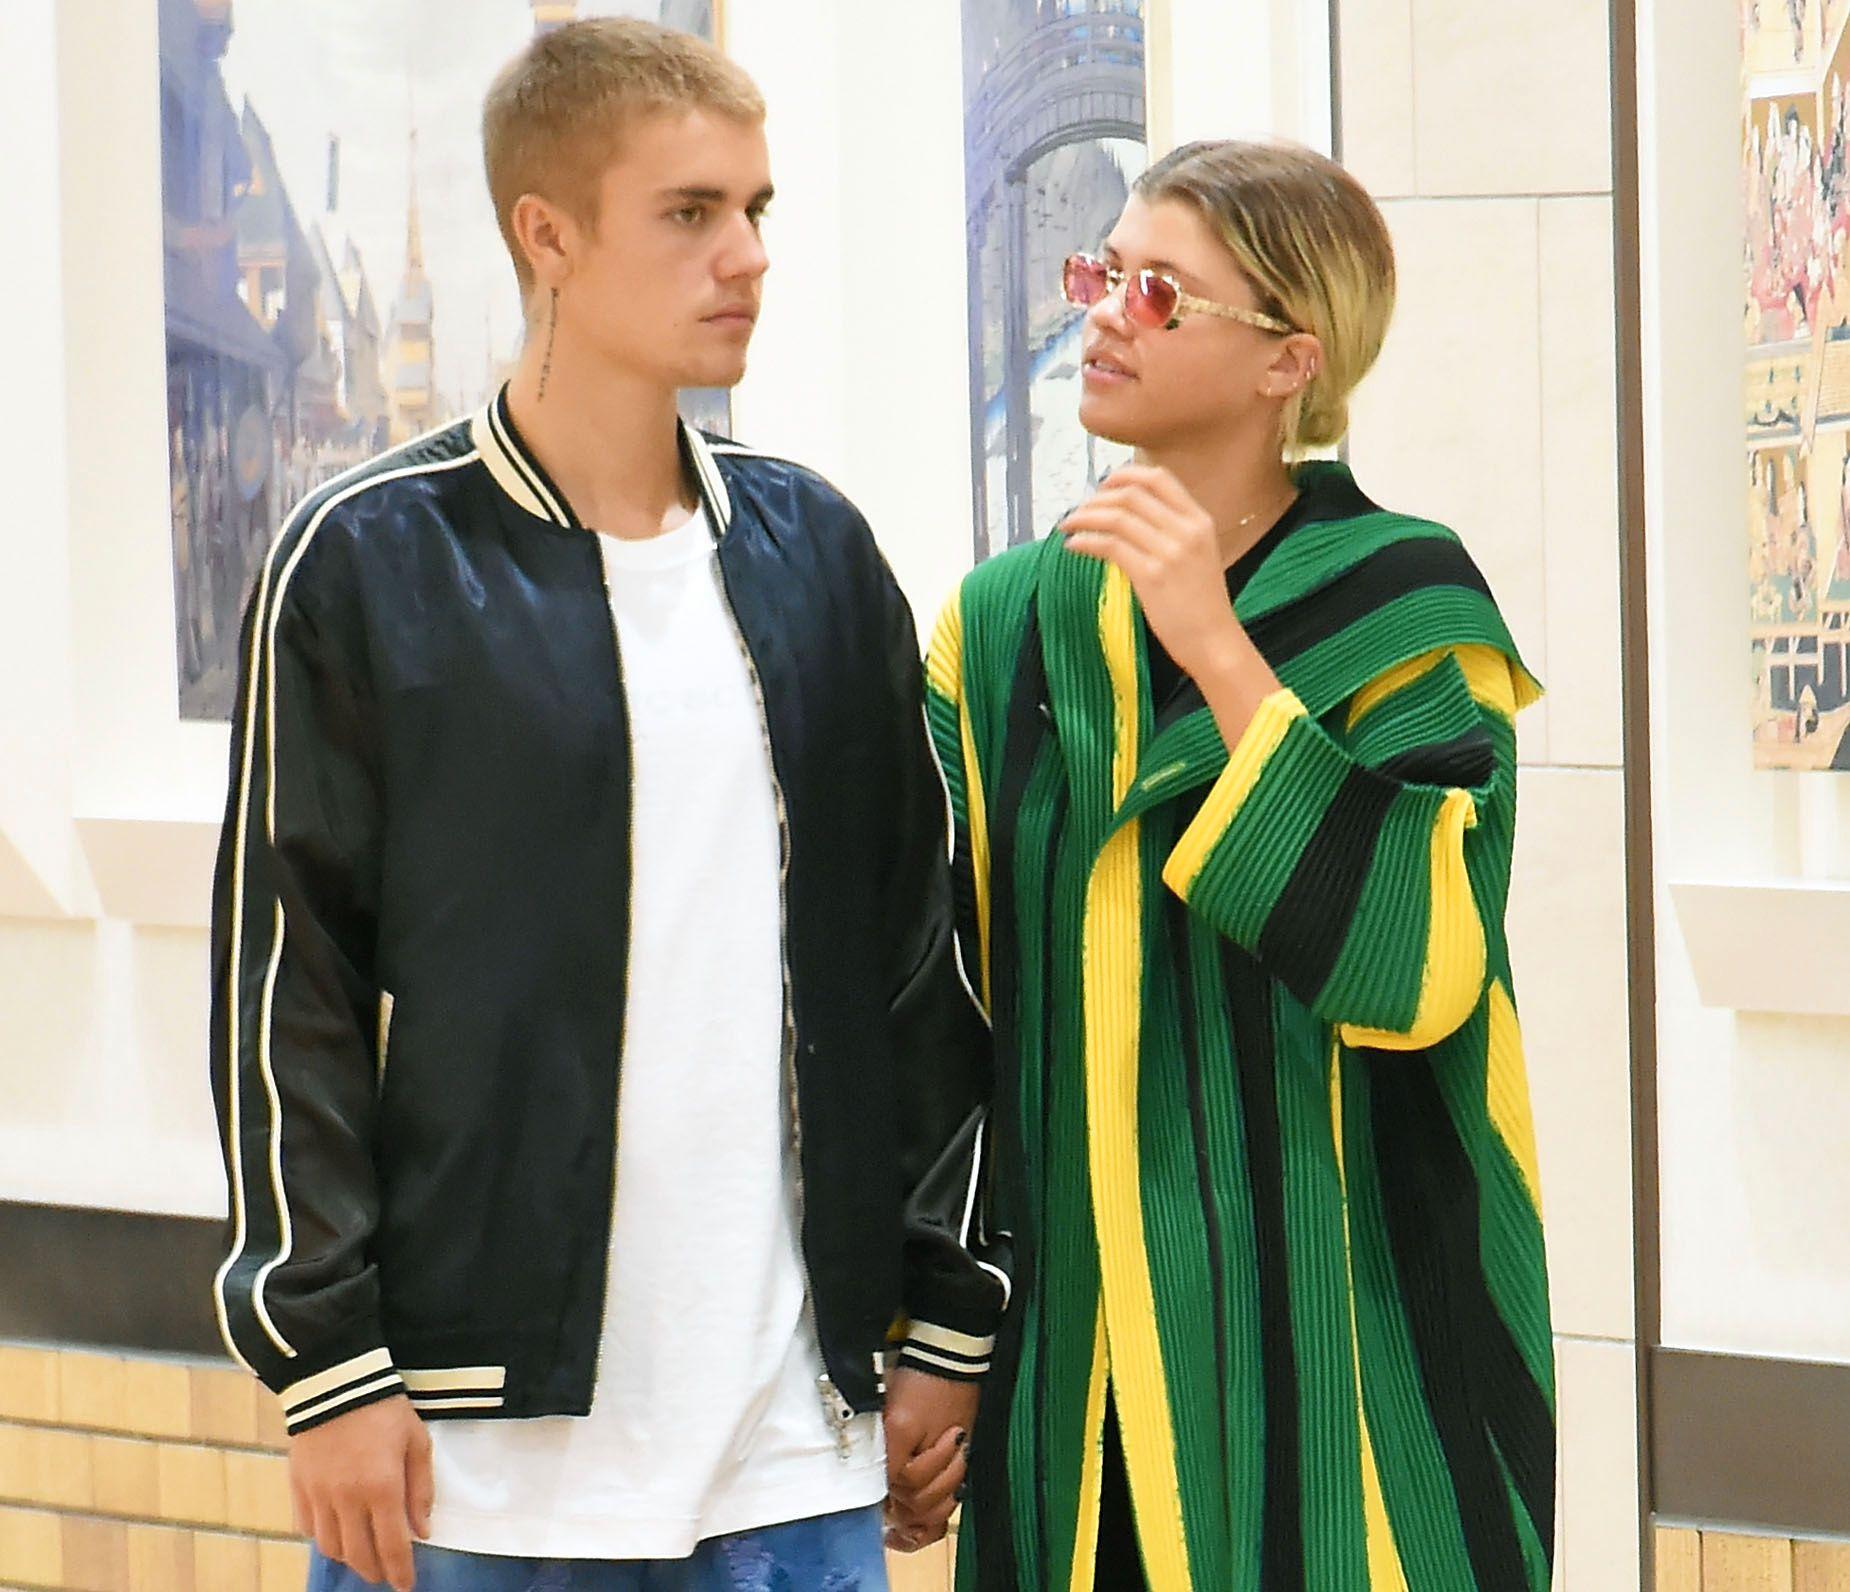 GOD TONE: Justin Bieber og Sofia Richie hånd i hånd på et kjøpesenter i Tokyo 14. august. Foto: JUN SATO/GC IMAGES